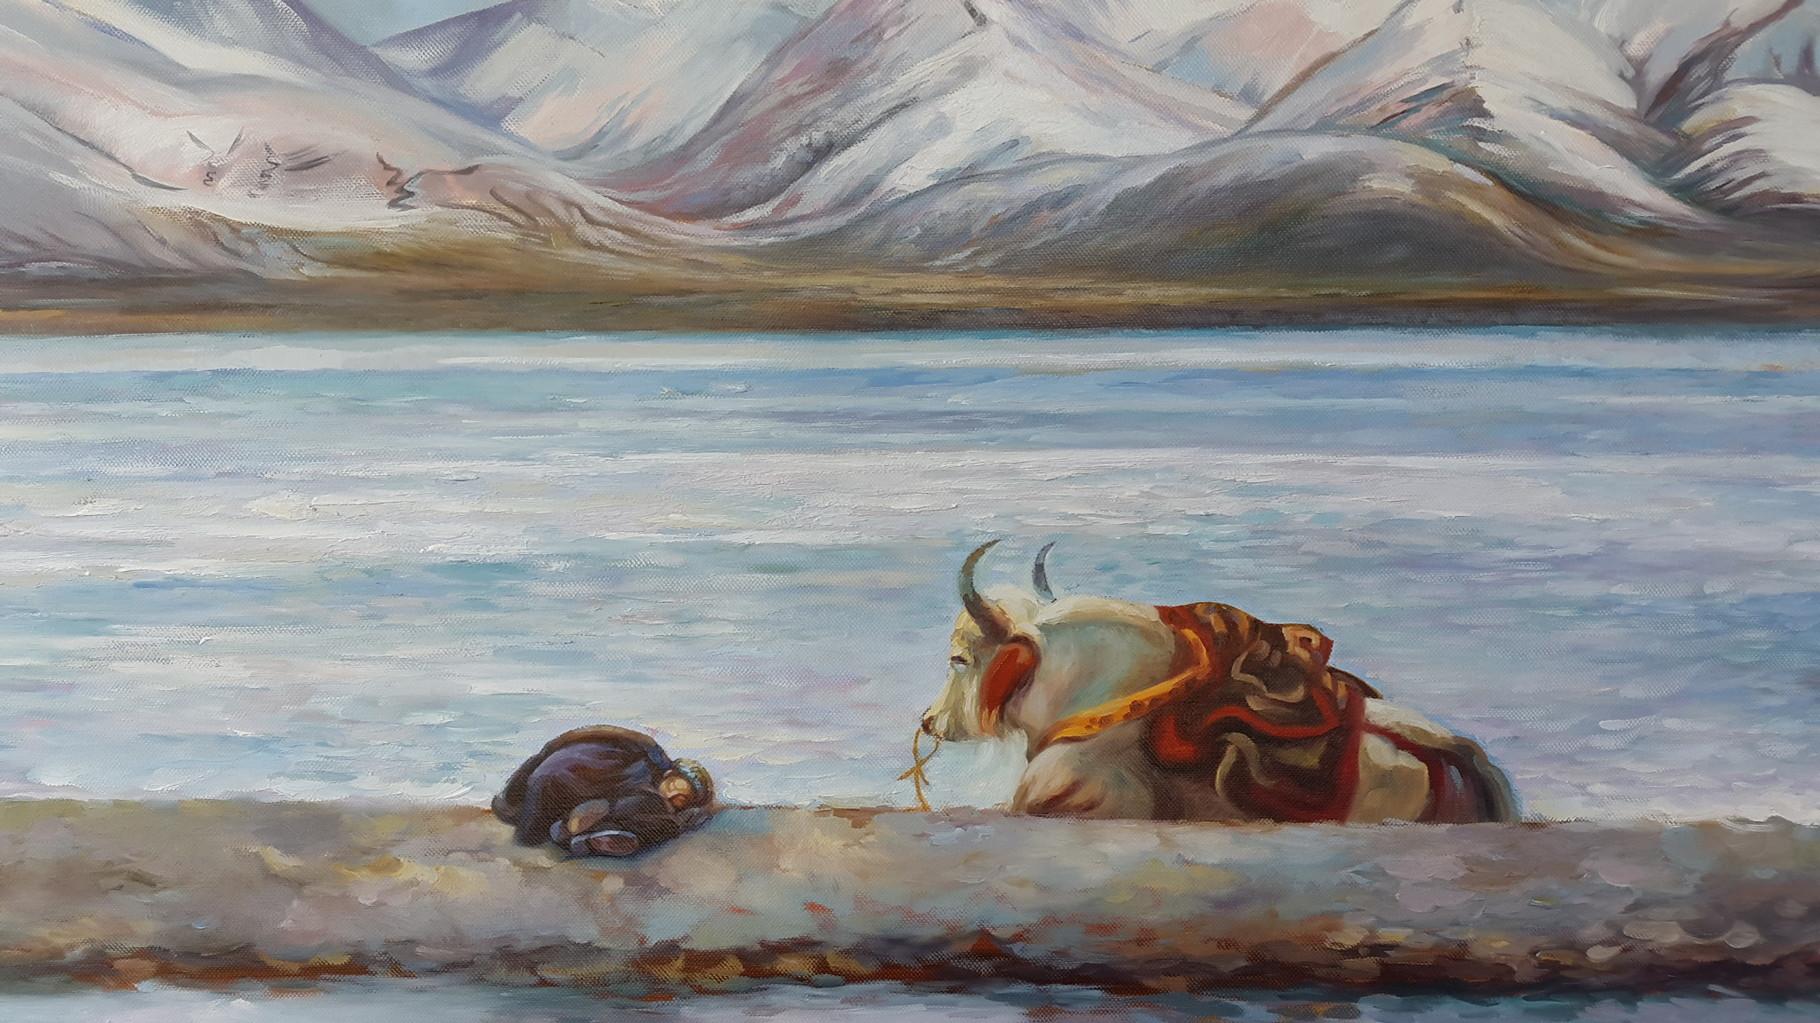 Yak (Ausschnitt), Öl auf Leinwand, 100 x 80 cm